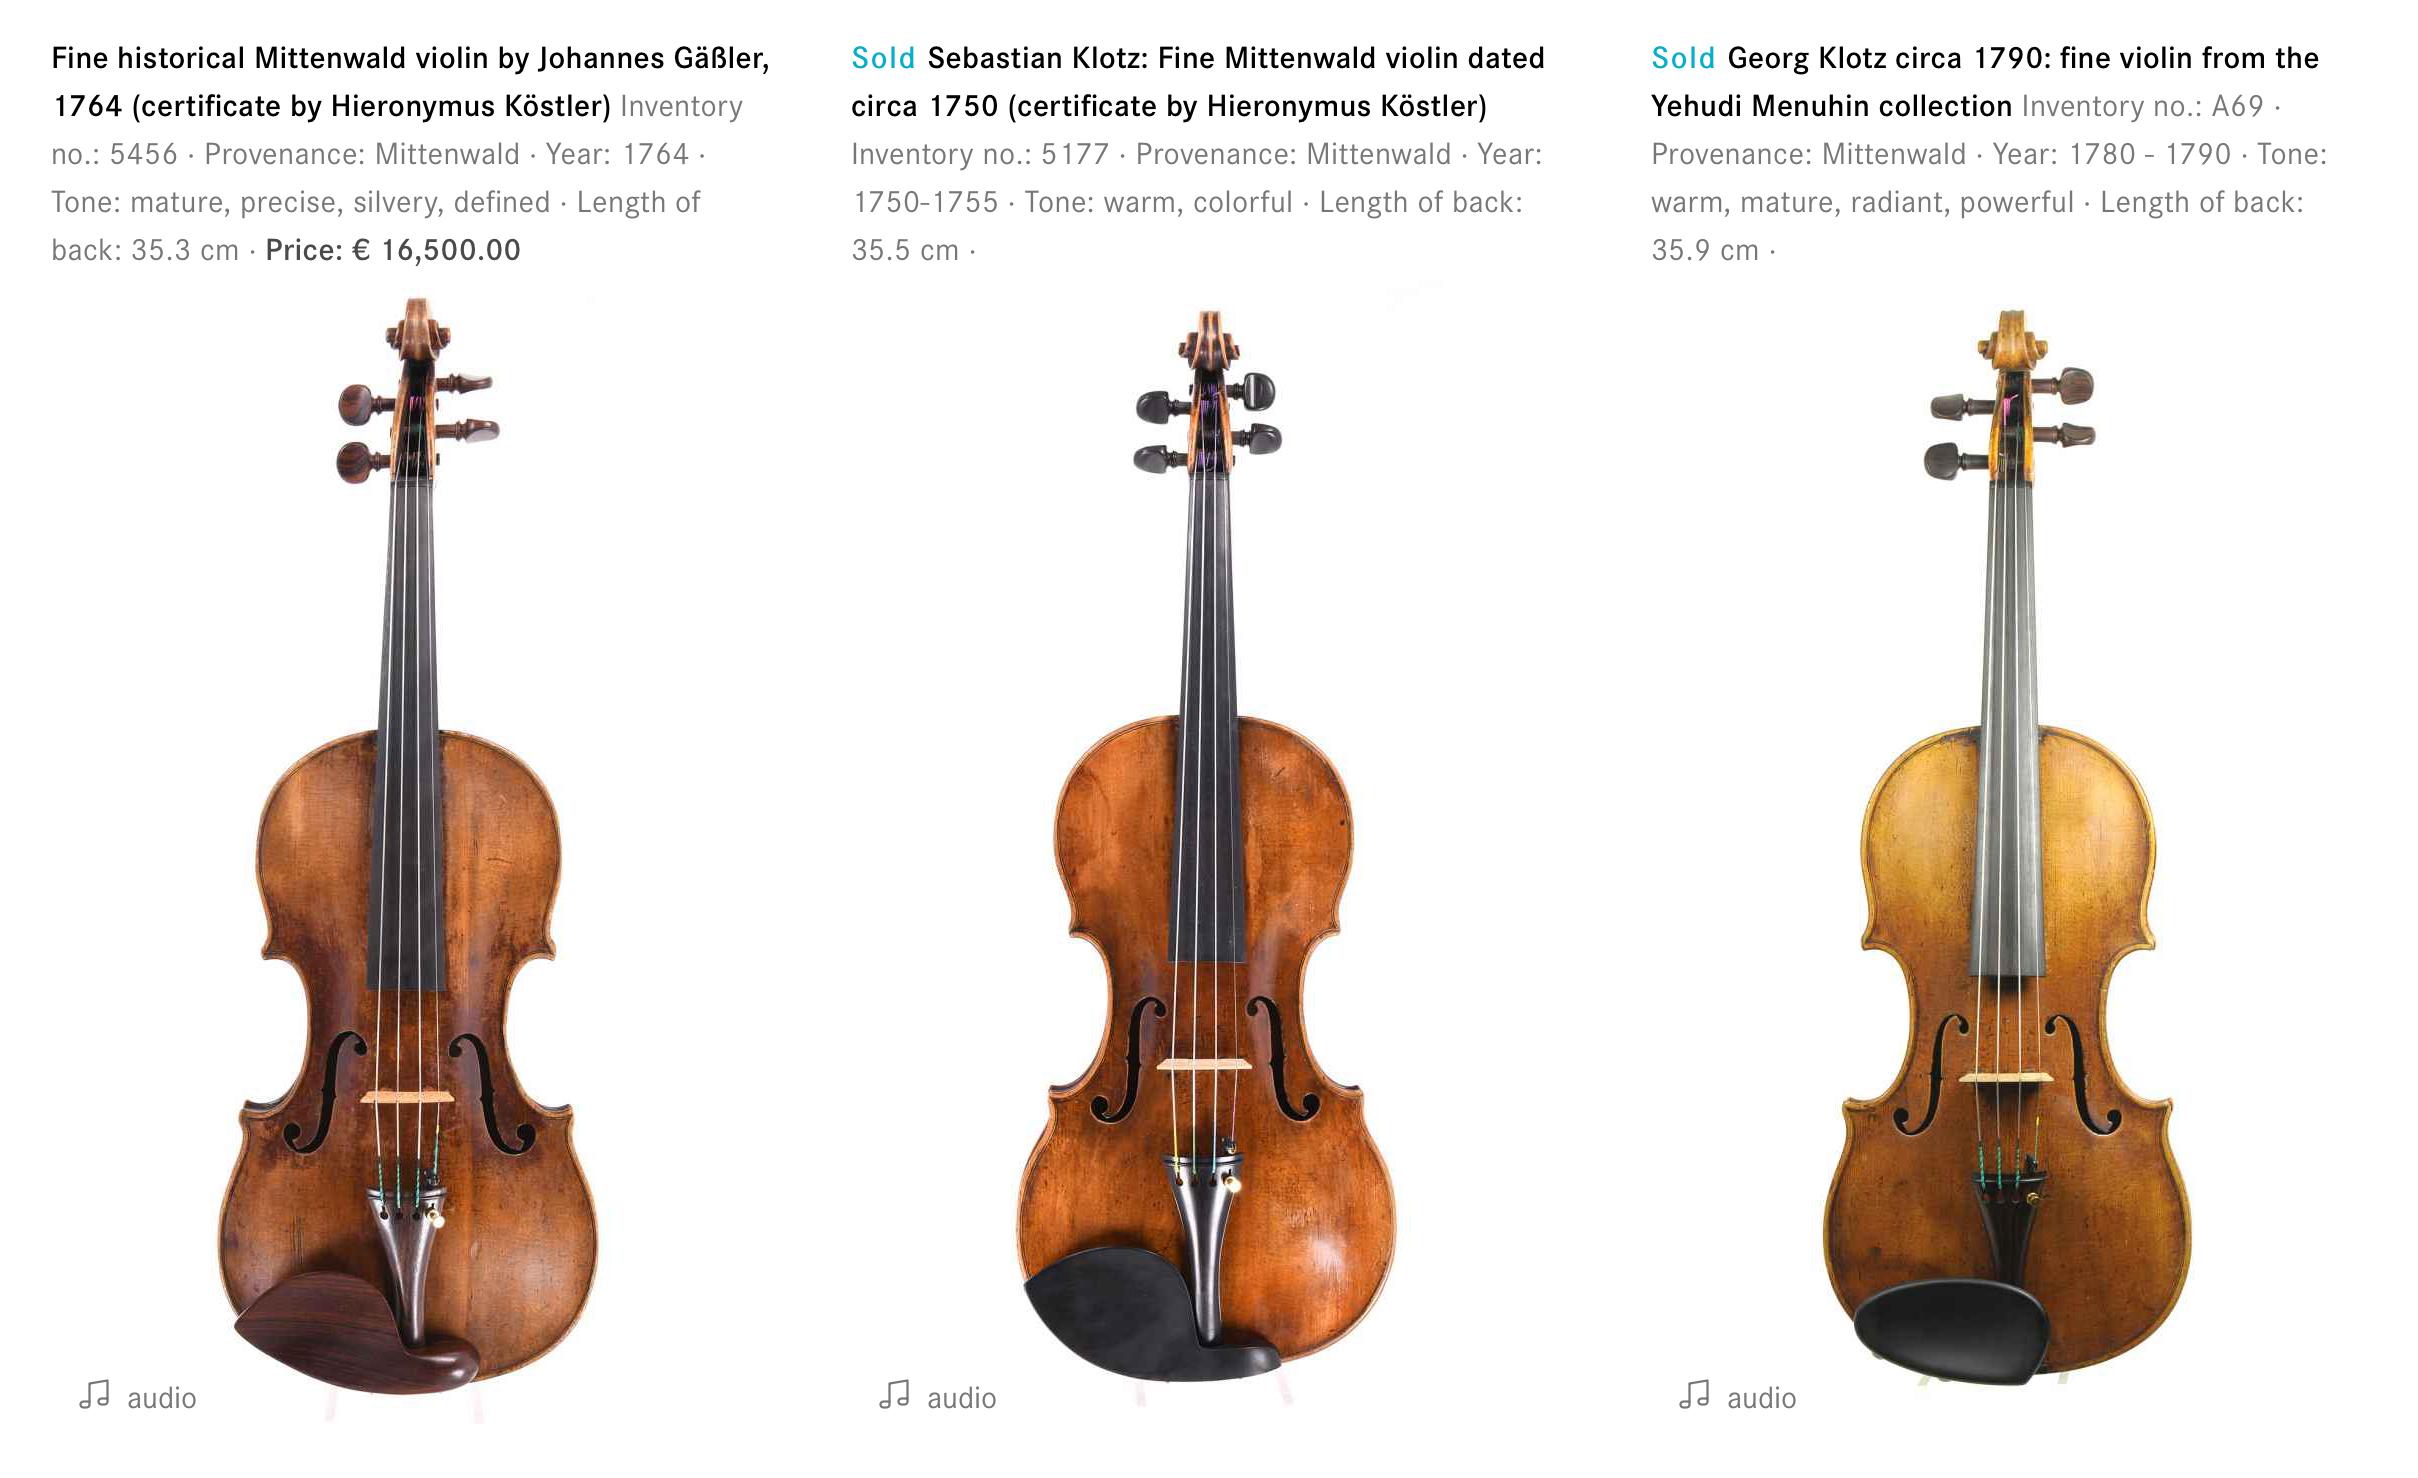 Three famous instruments by Johannes Gaessler, Sebastian Klotz and Georg Klotz